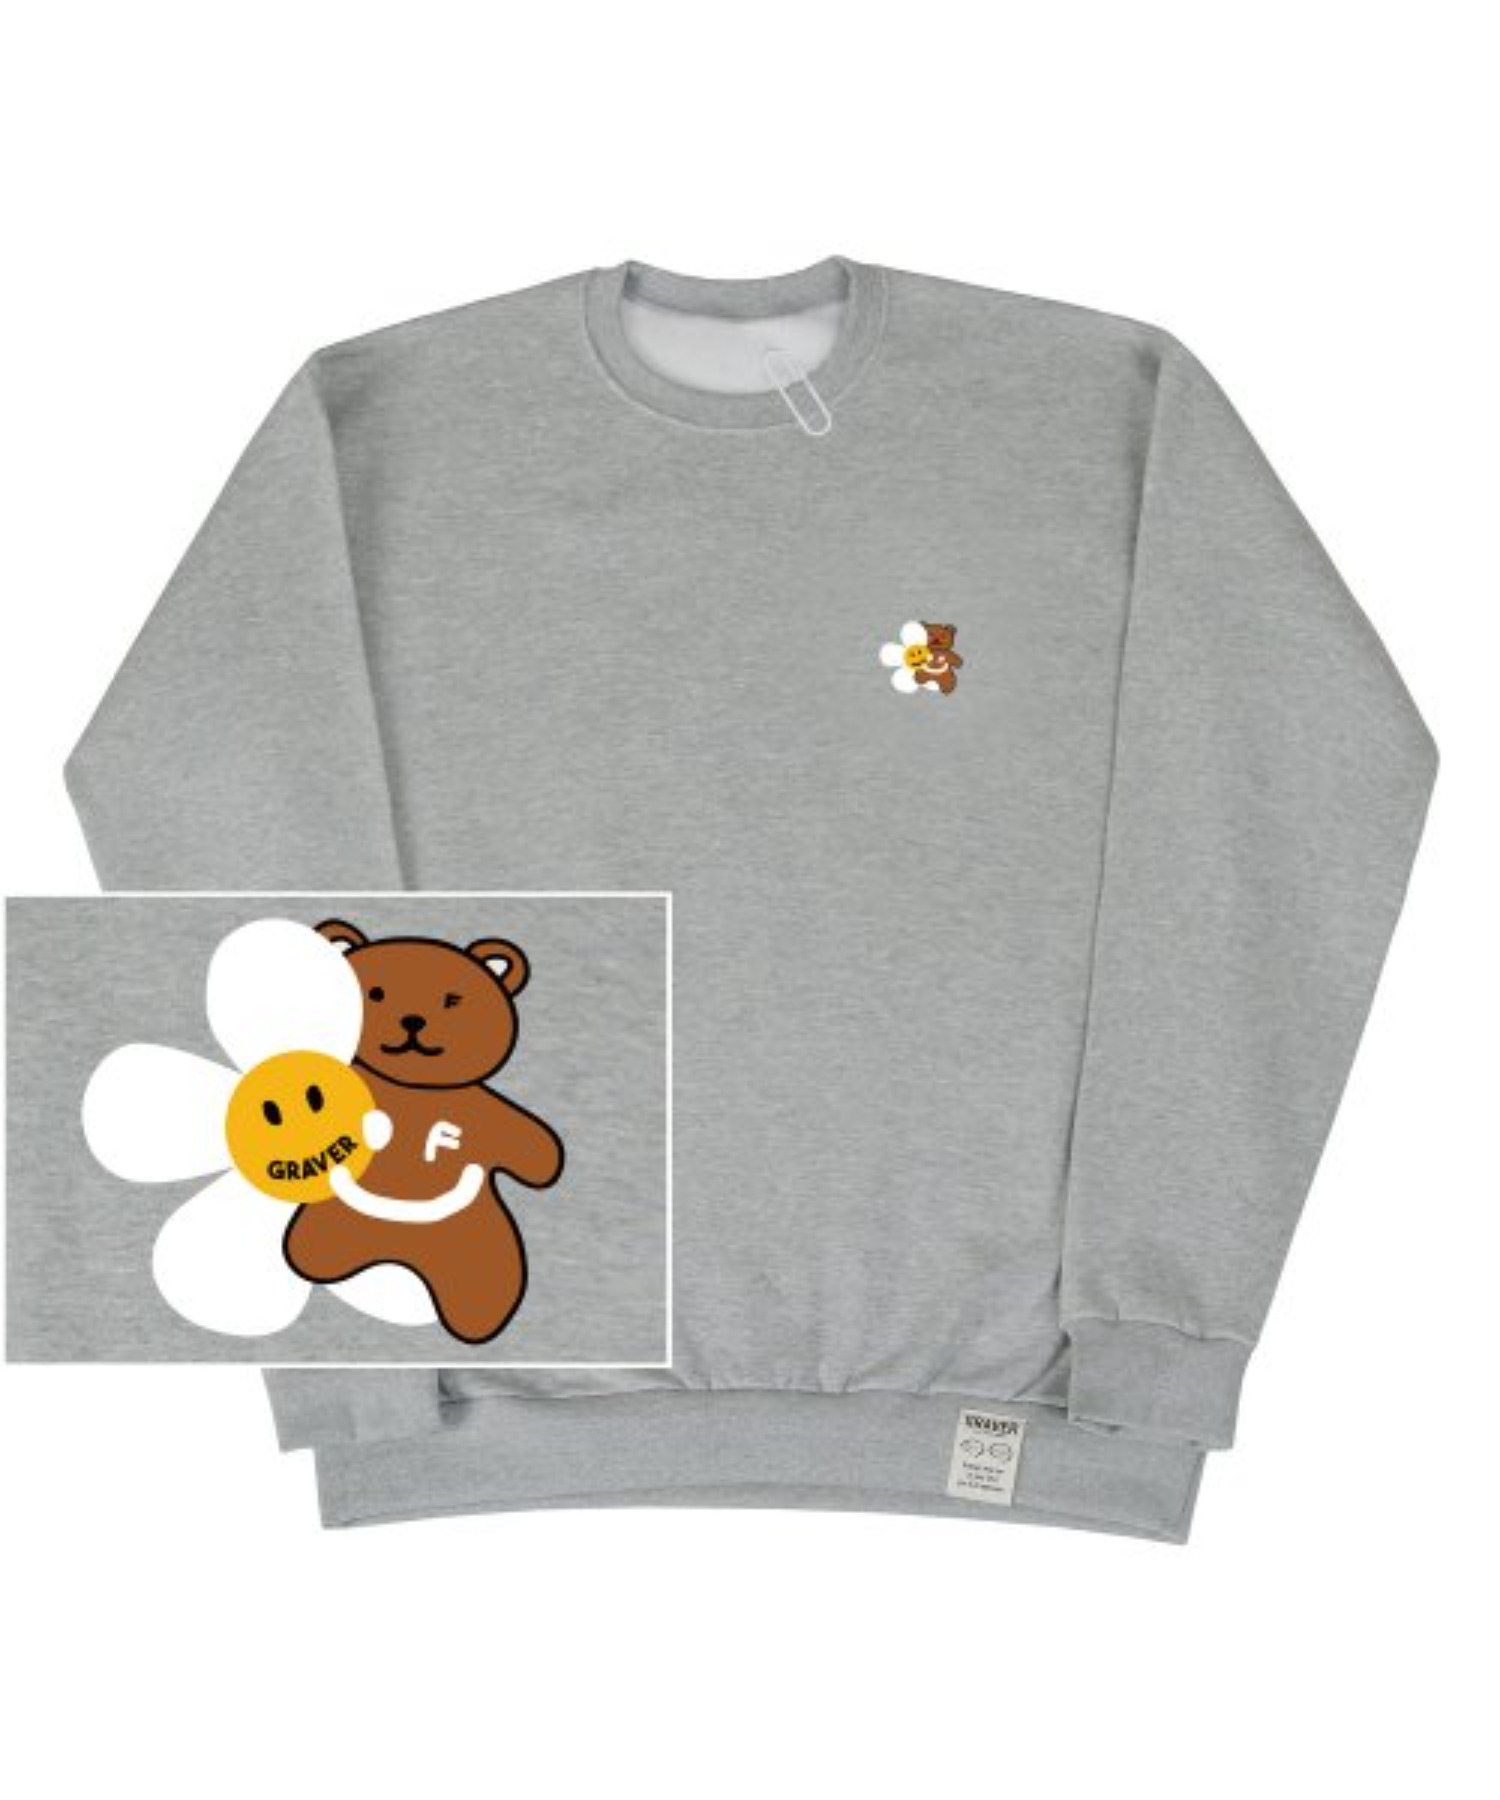 [UNISEX] Small Flower Bear Smile White Clip Sweatshirt_Gray